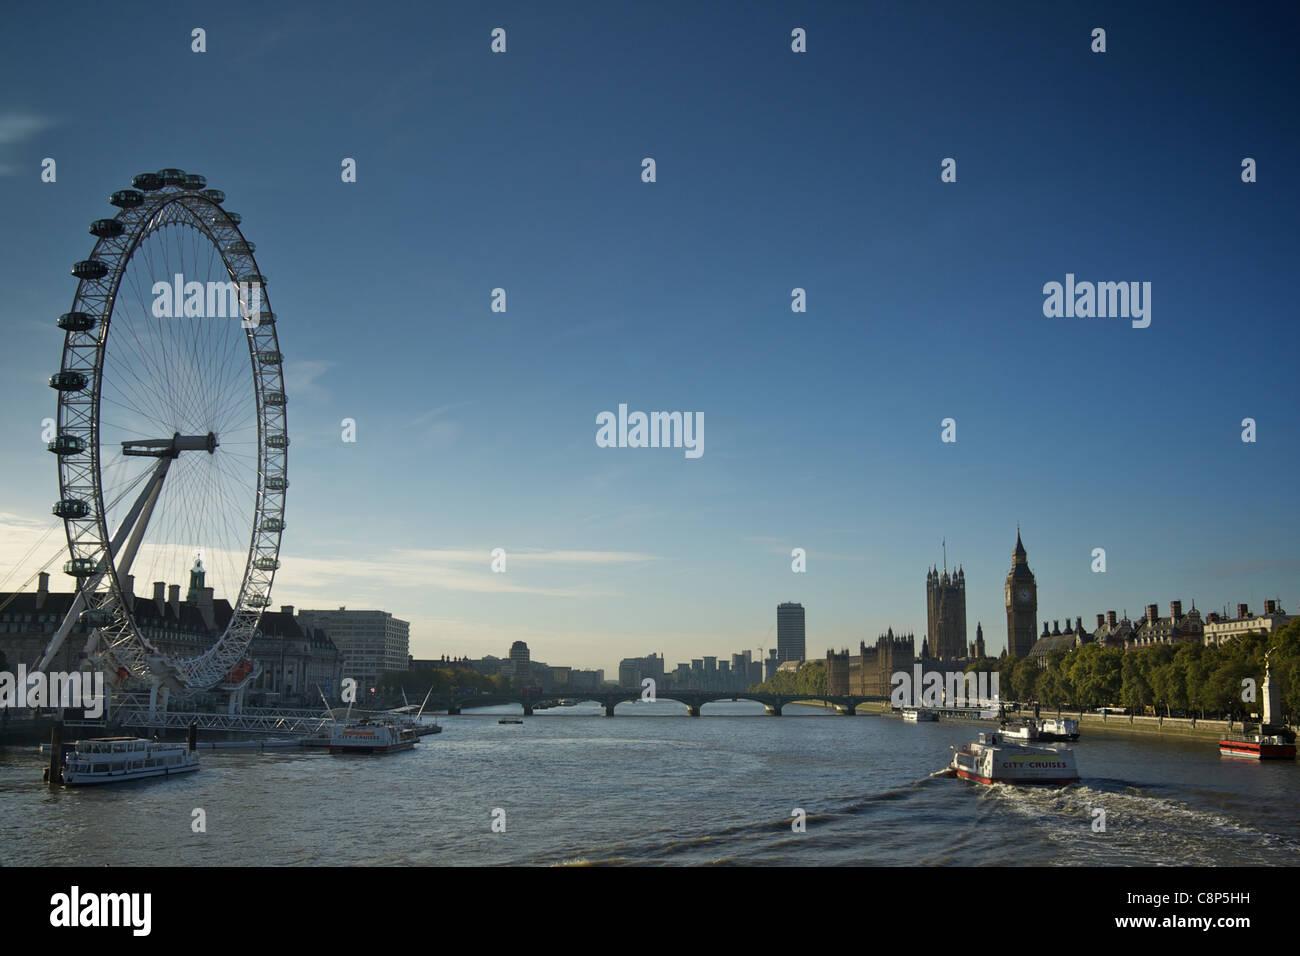 The London Eye and skyline from Golden Jubilee Bridge Stock Photo